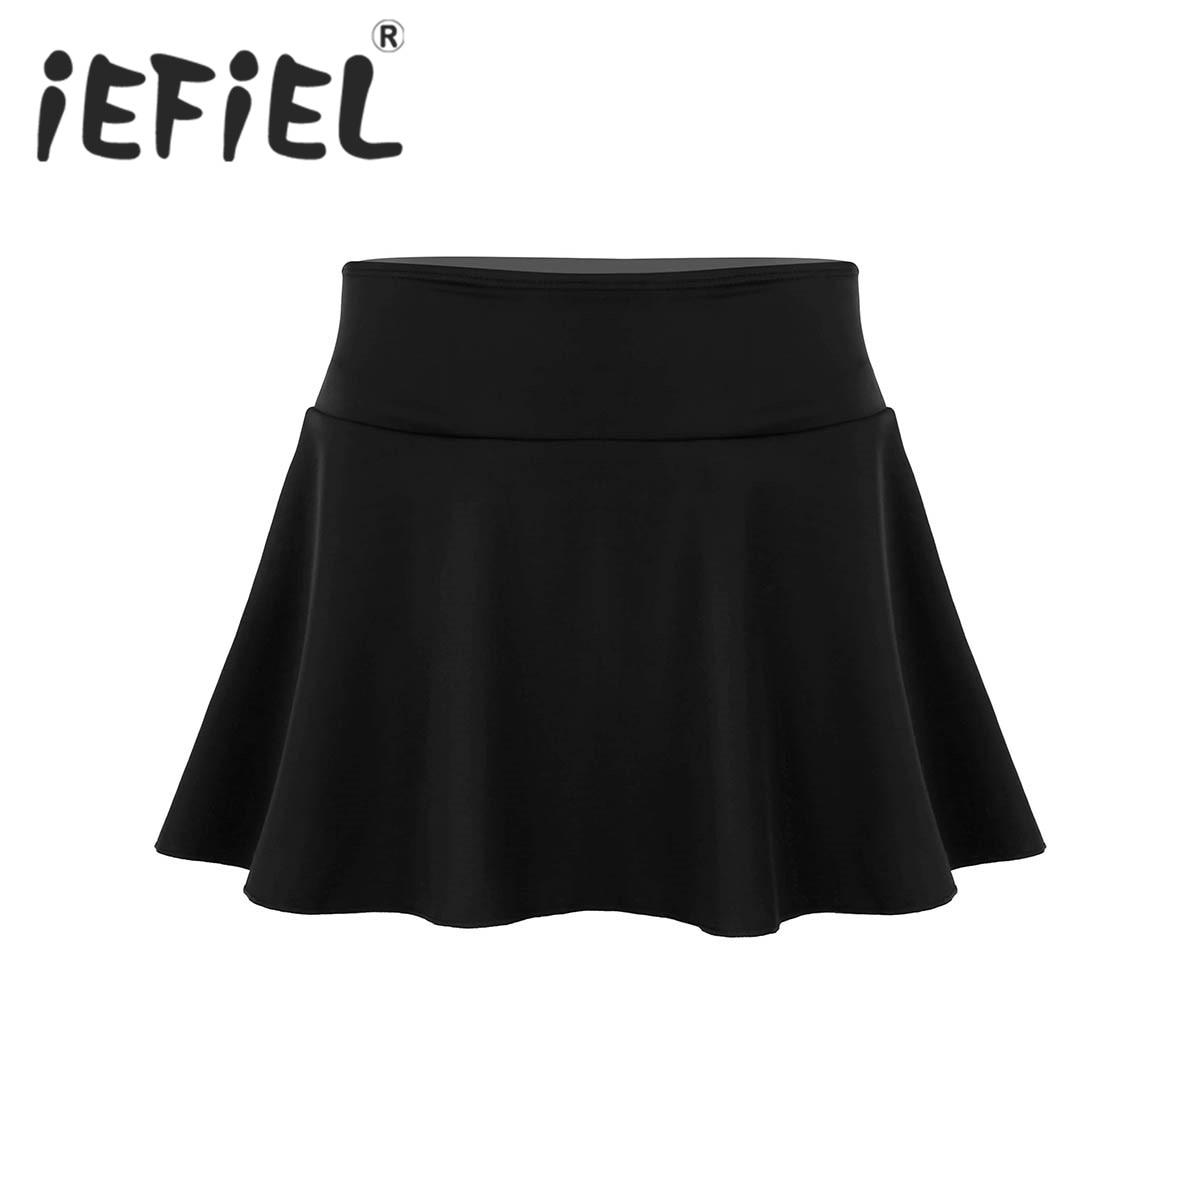 Female Women Solid Color High Waisted Ruffle Swim Skirt with Built-in Bikini Brief Swimsuit Bottom for Swimming Beachwear Skirt